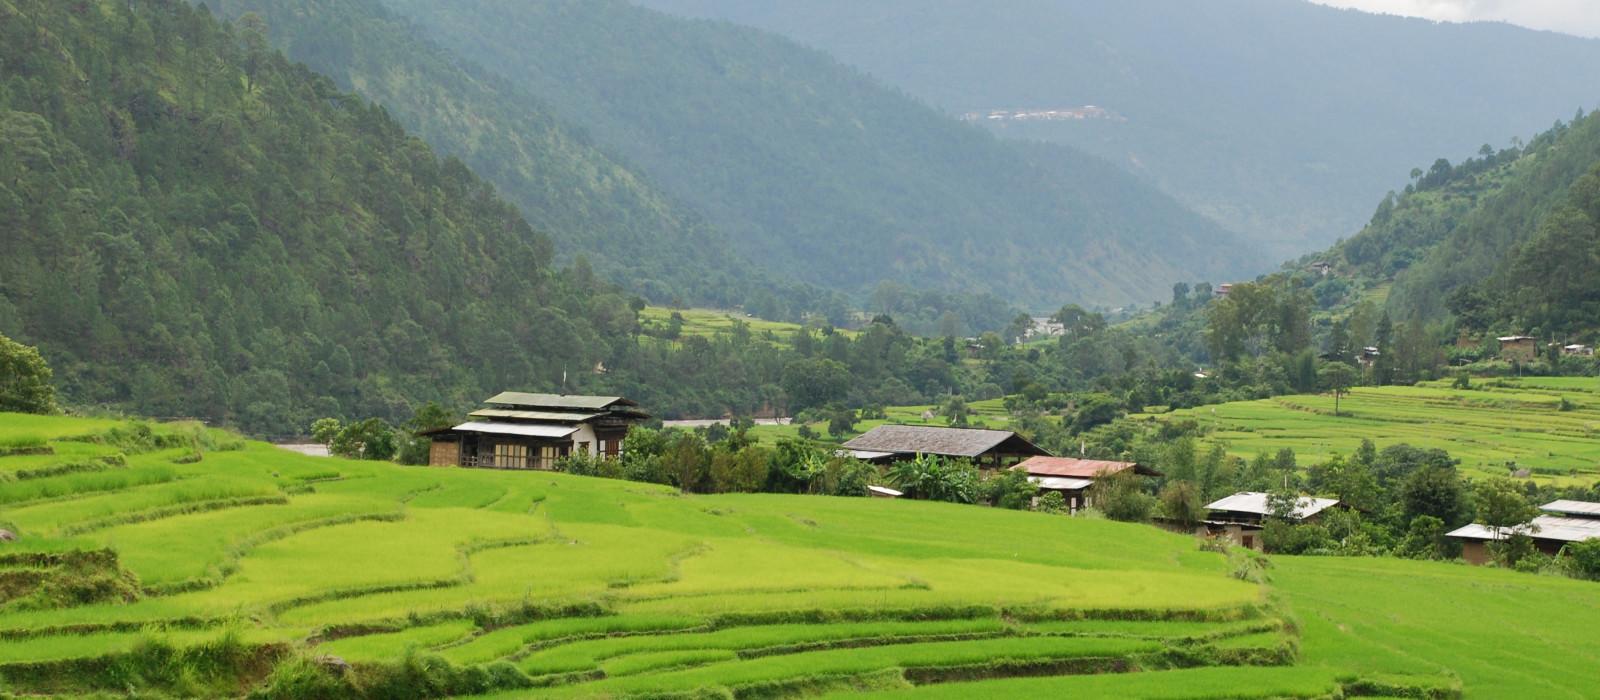 Hotel Lhuentse Tented Camp Bhutan